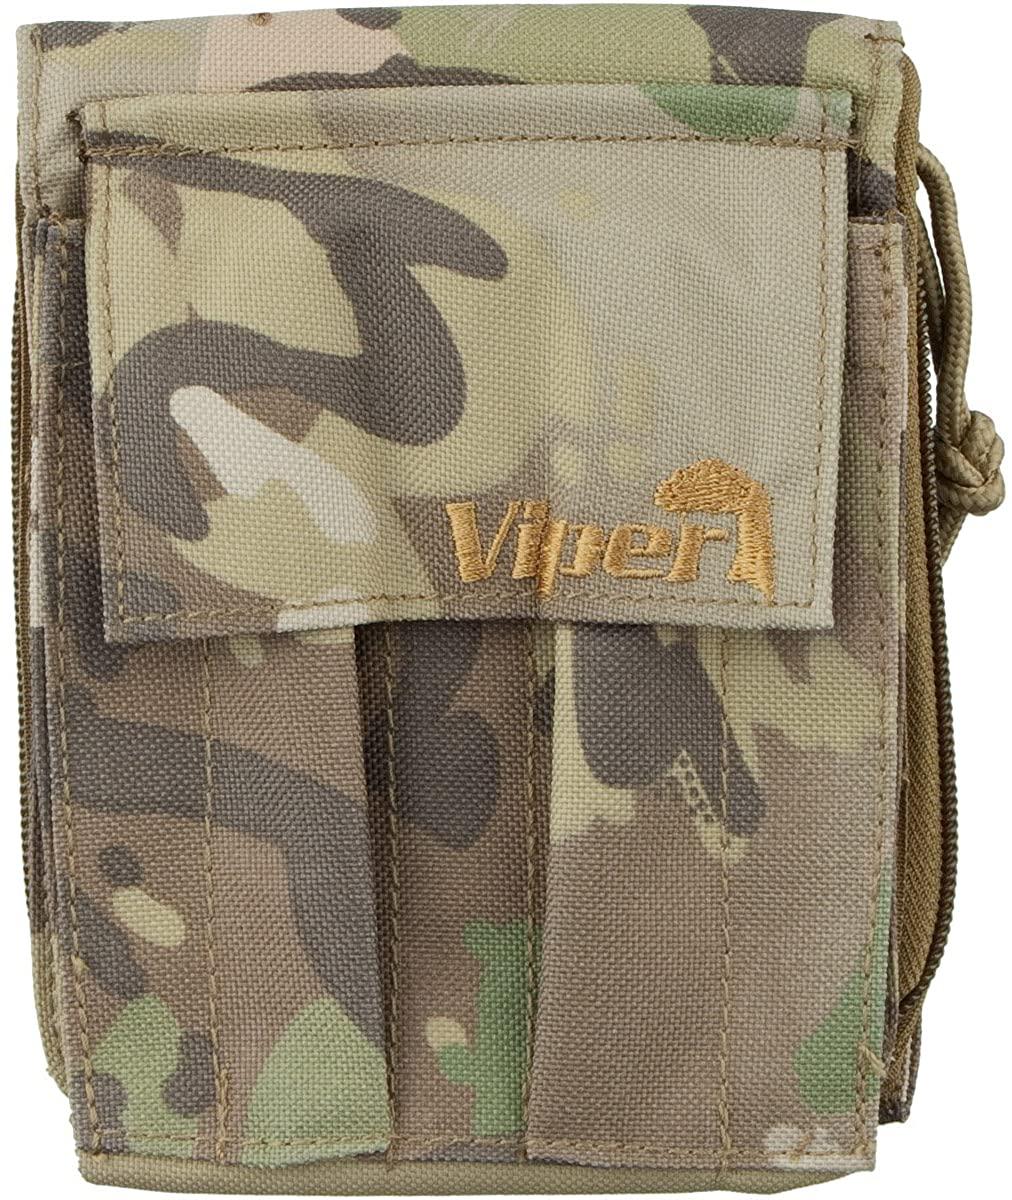 Viper A6 Notebook Holder V-Cam